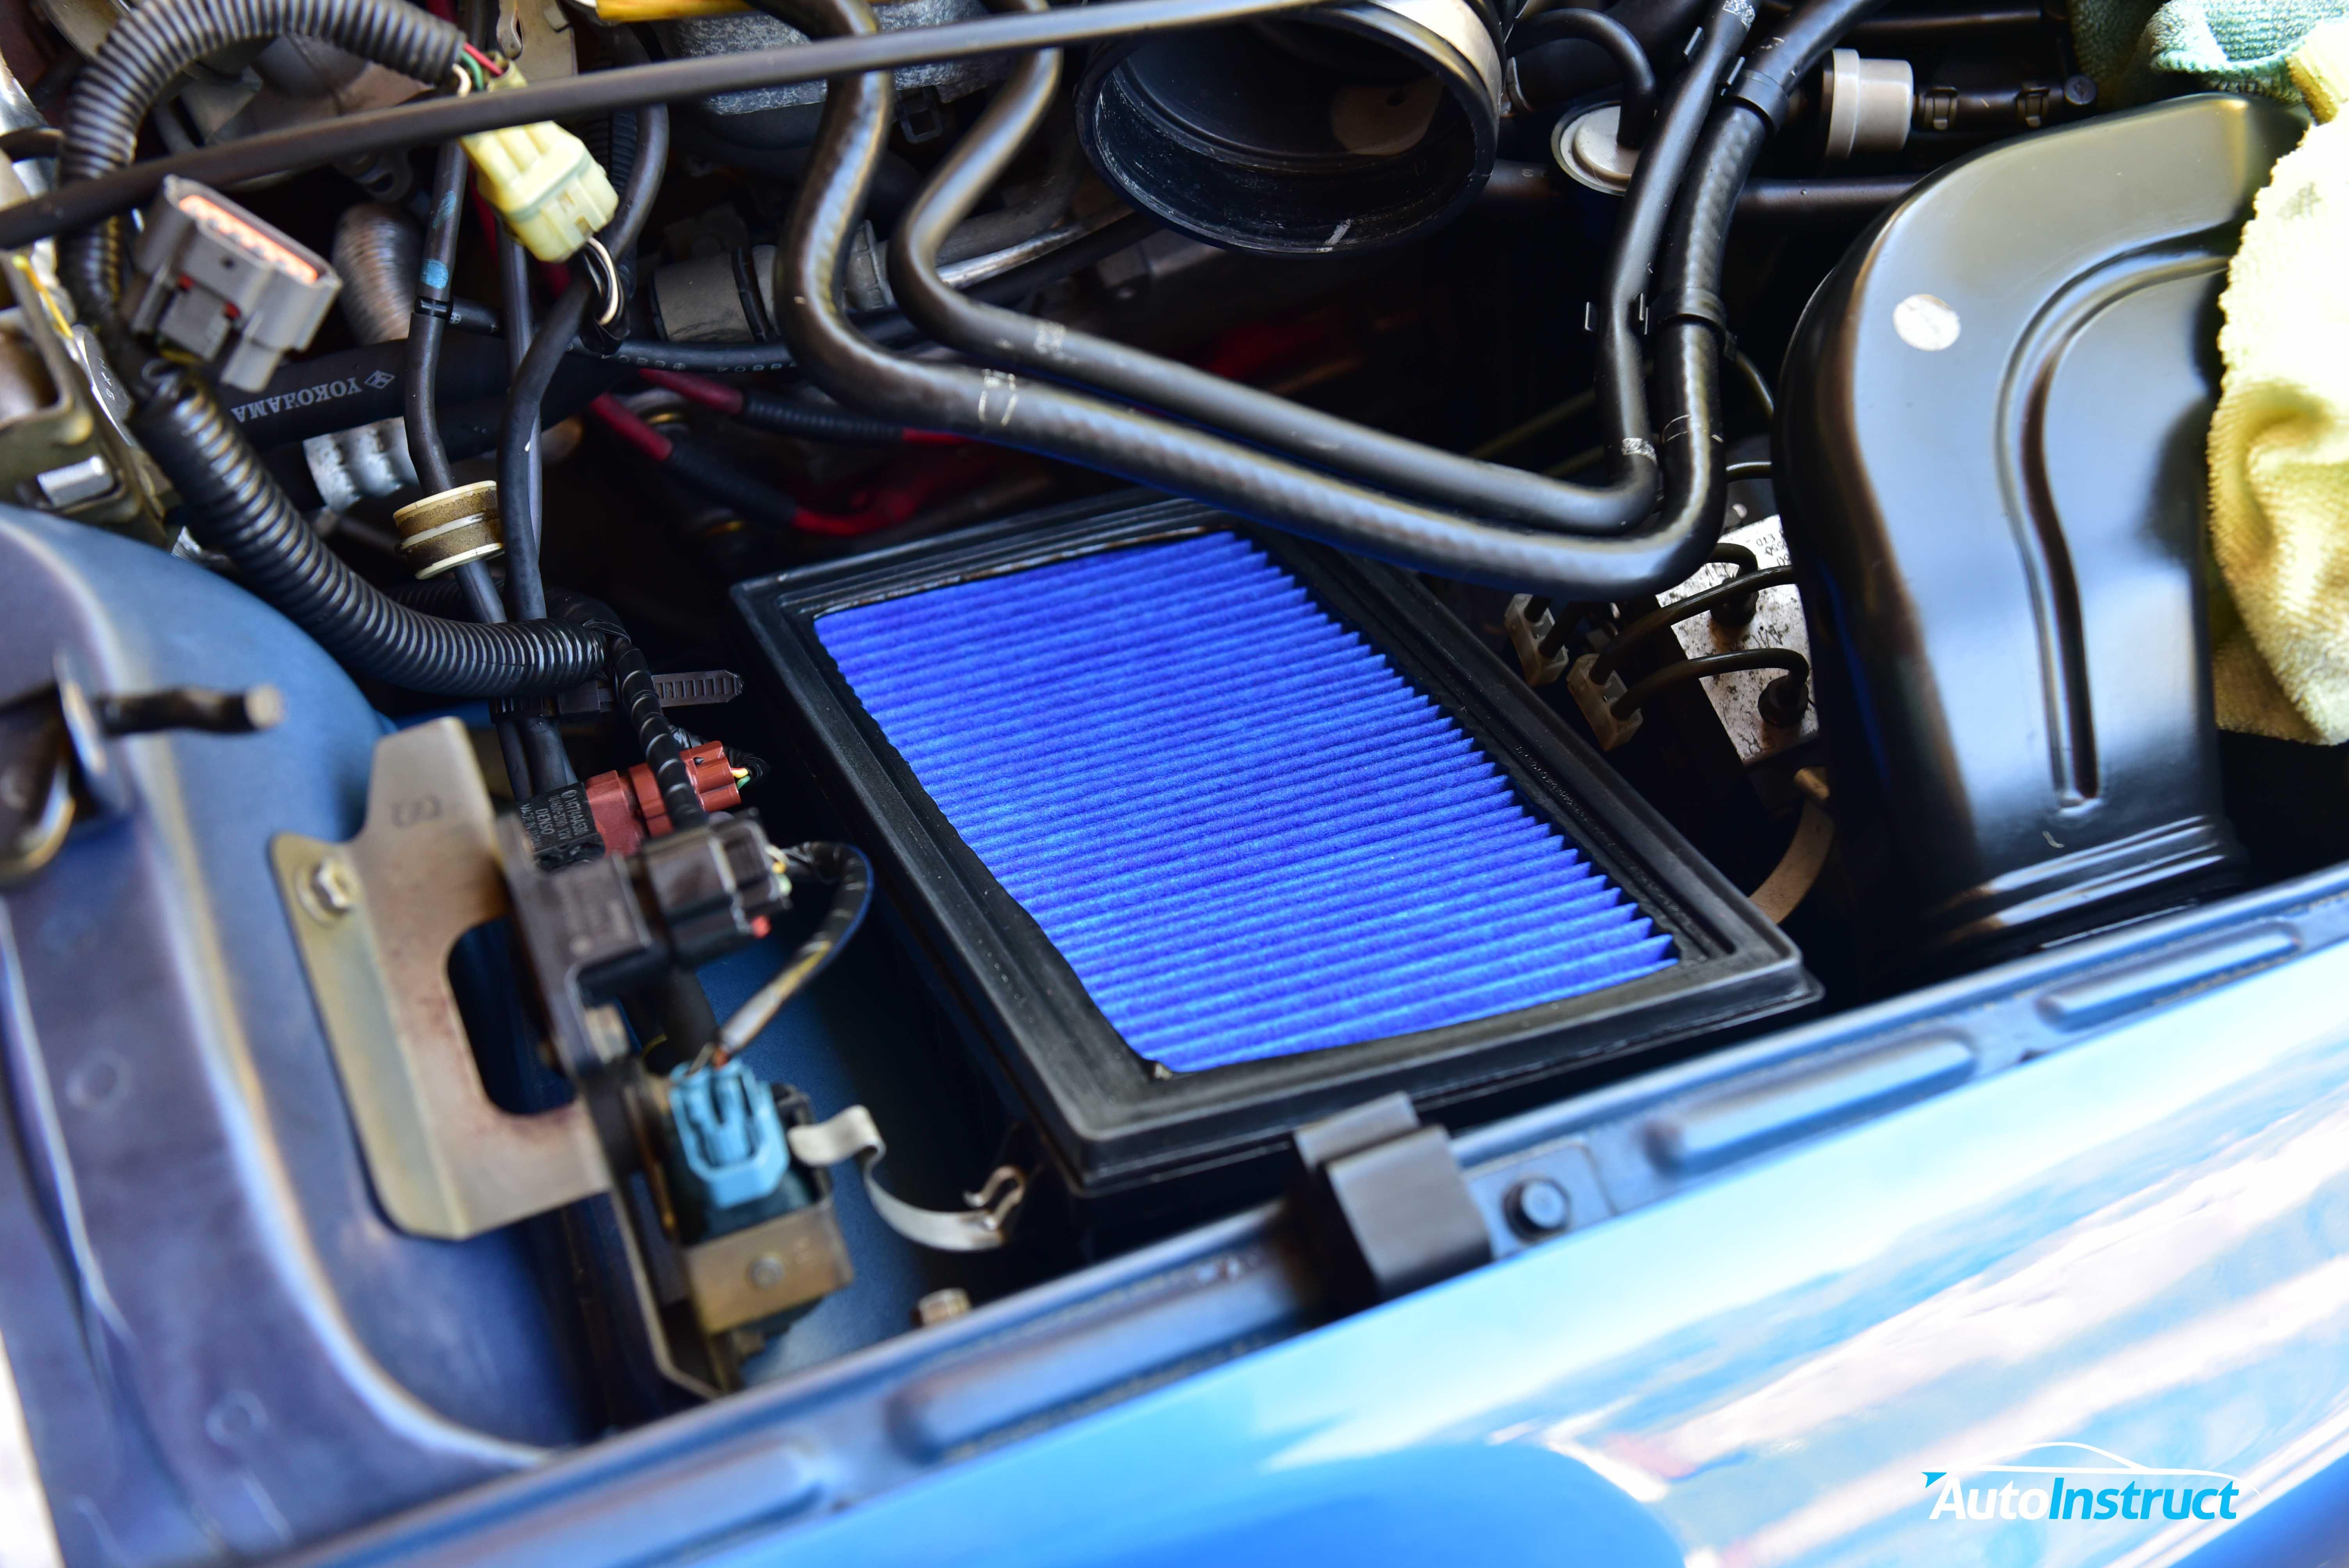 GC8 Impreza WRX Engine Air Filter Replacement